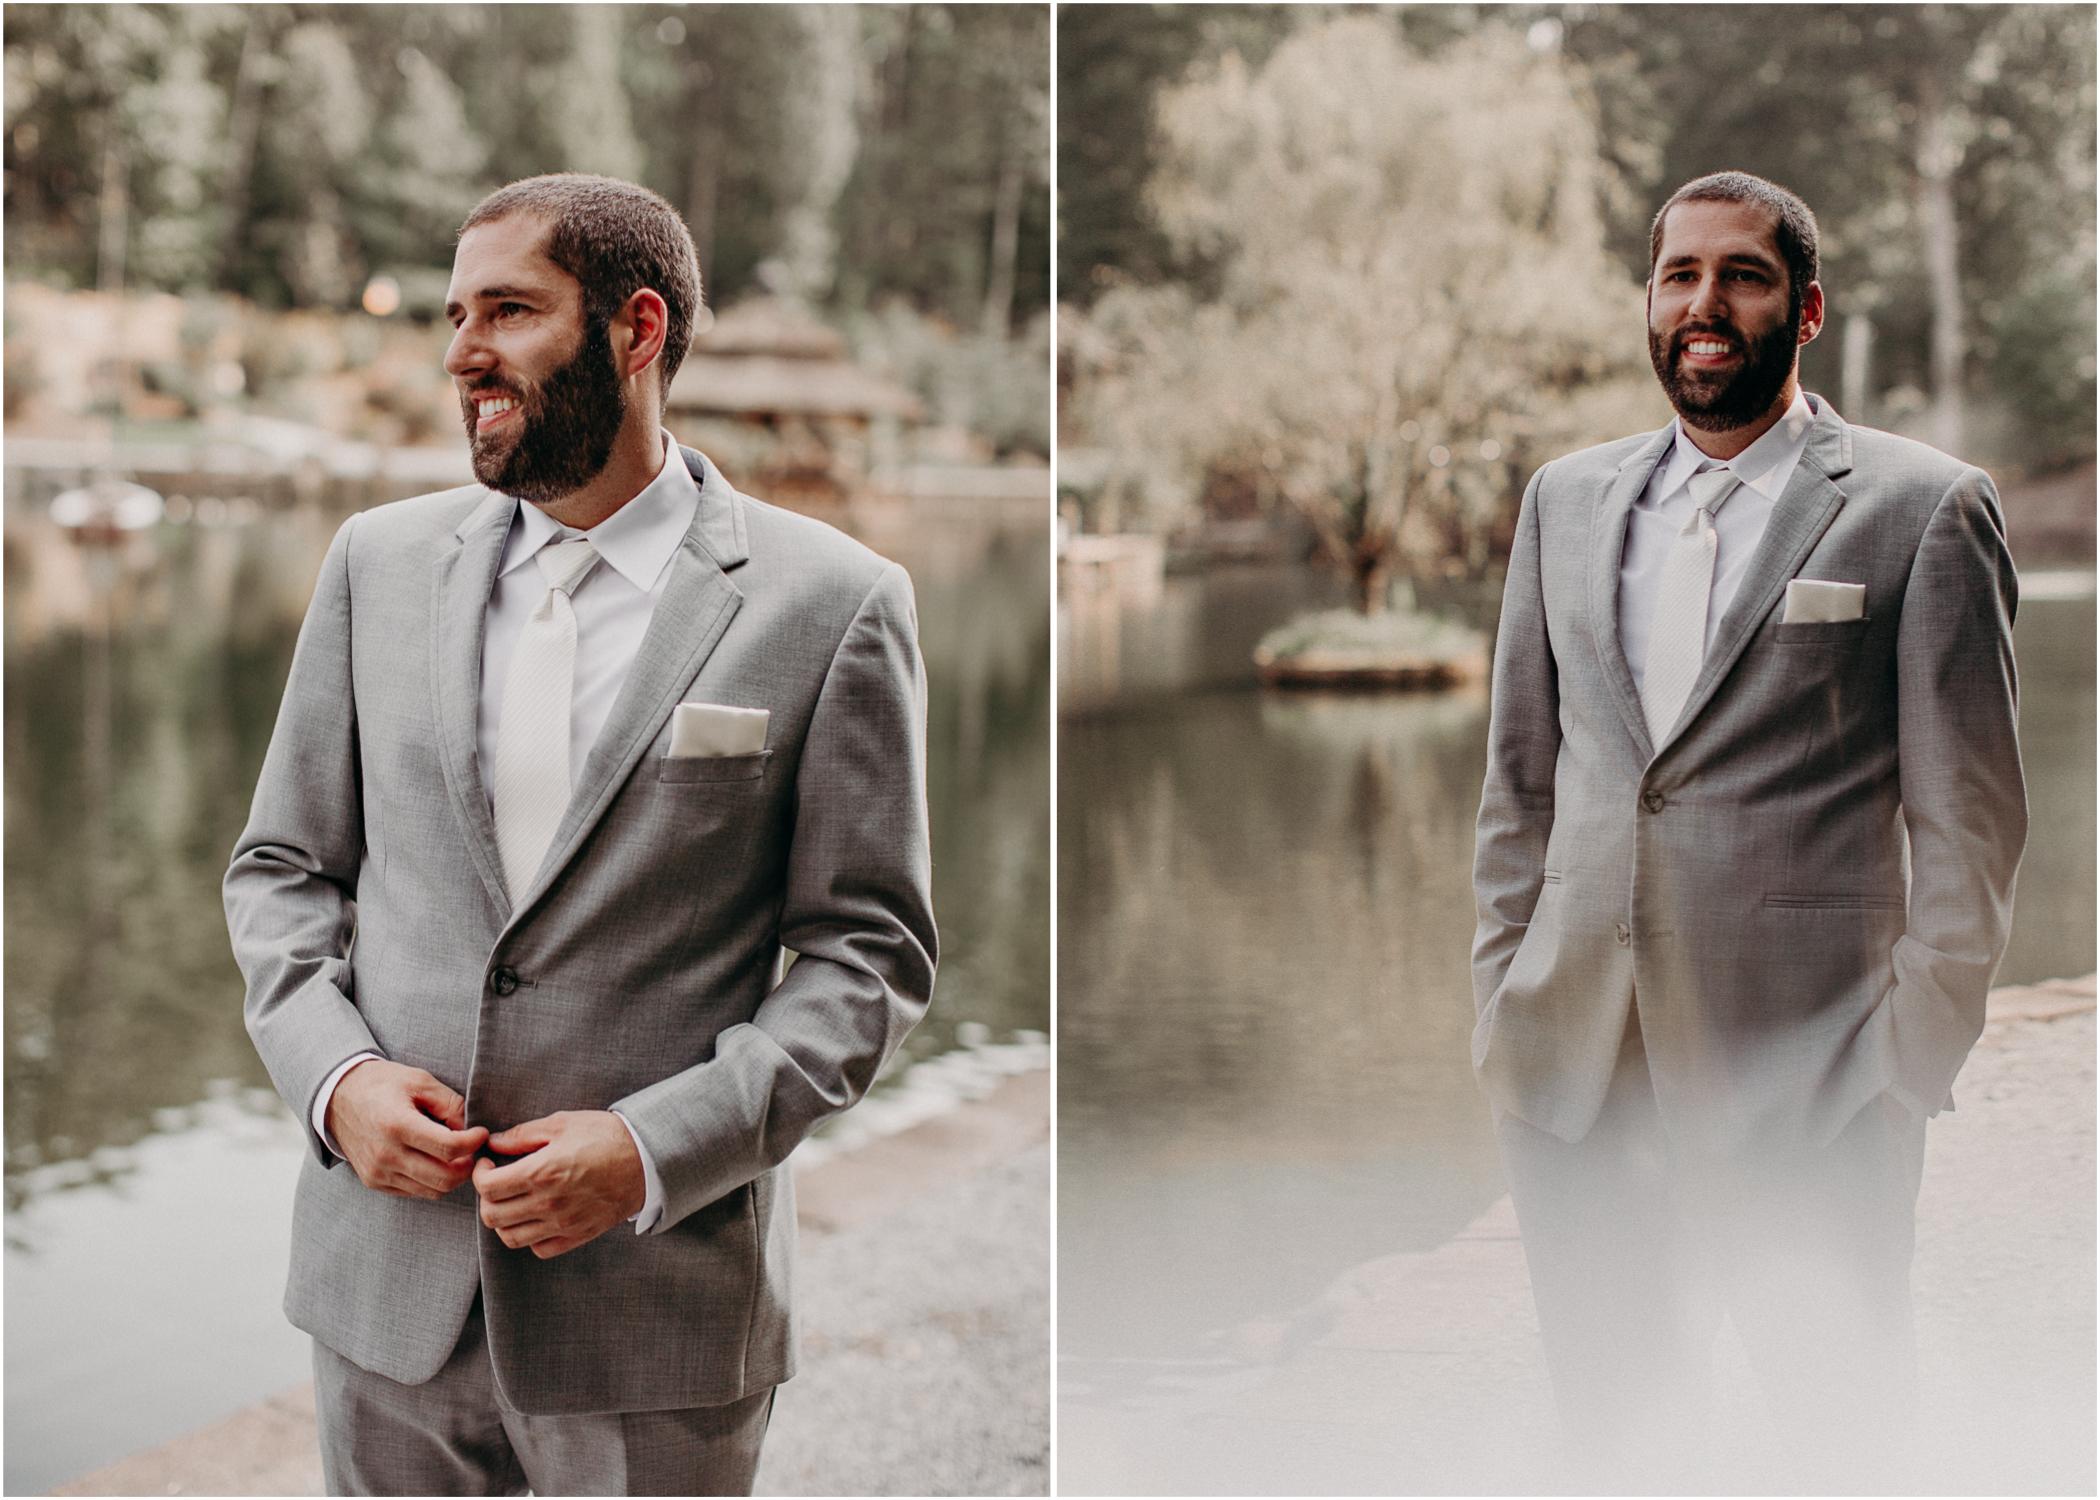 36 wedding day portraits bride and groom atlanta - georgia - ga wedding photographer .jpg